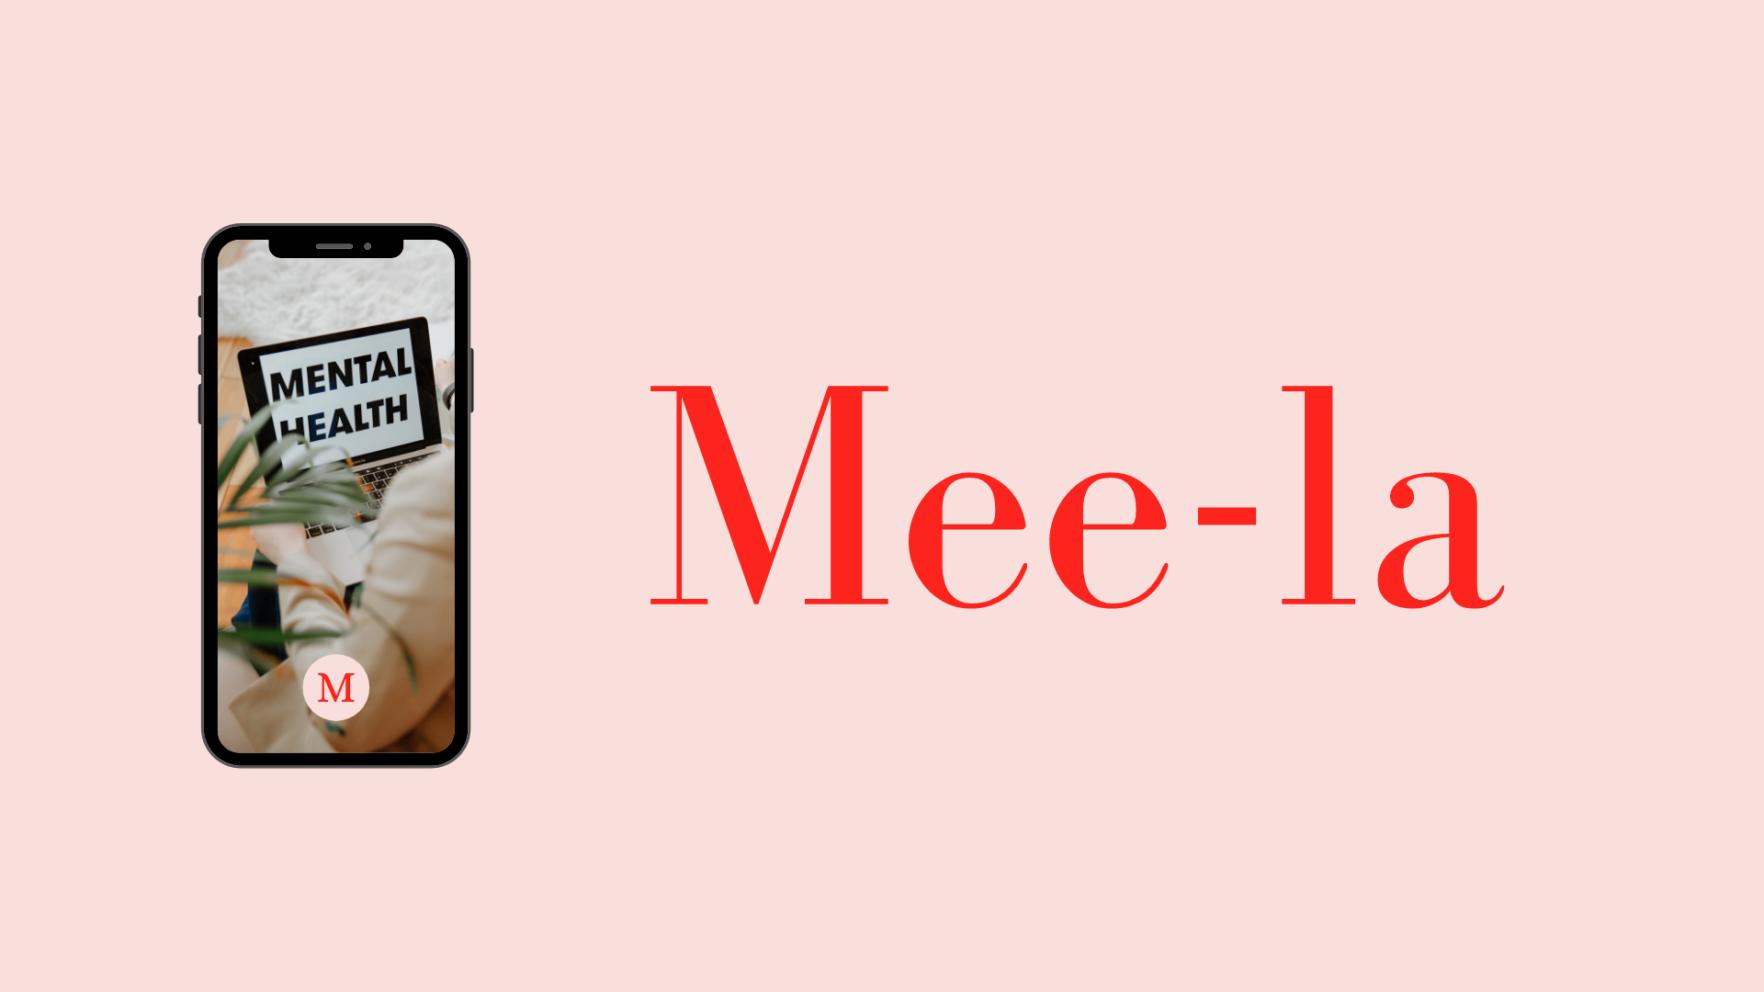 Mee-la